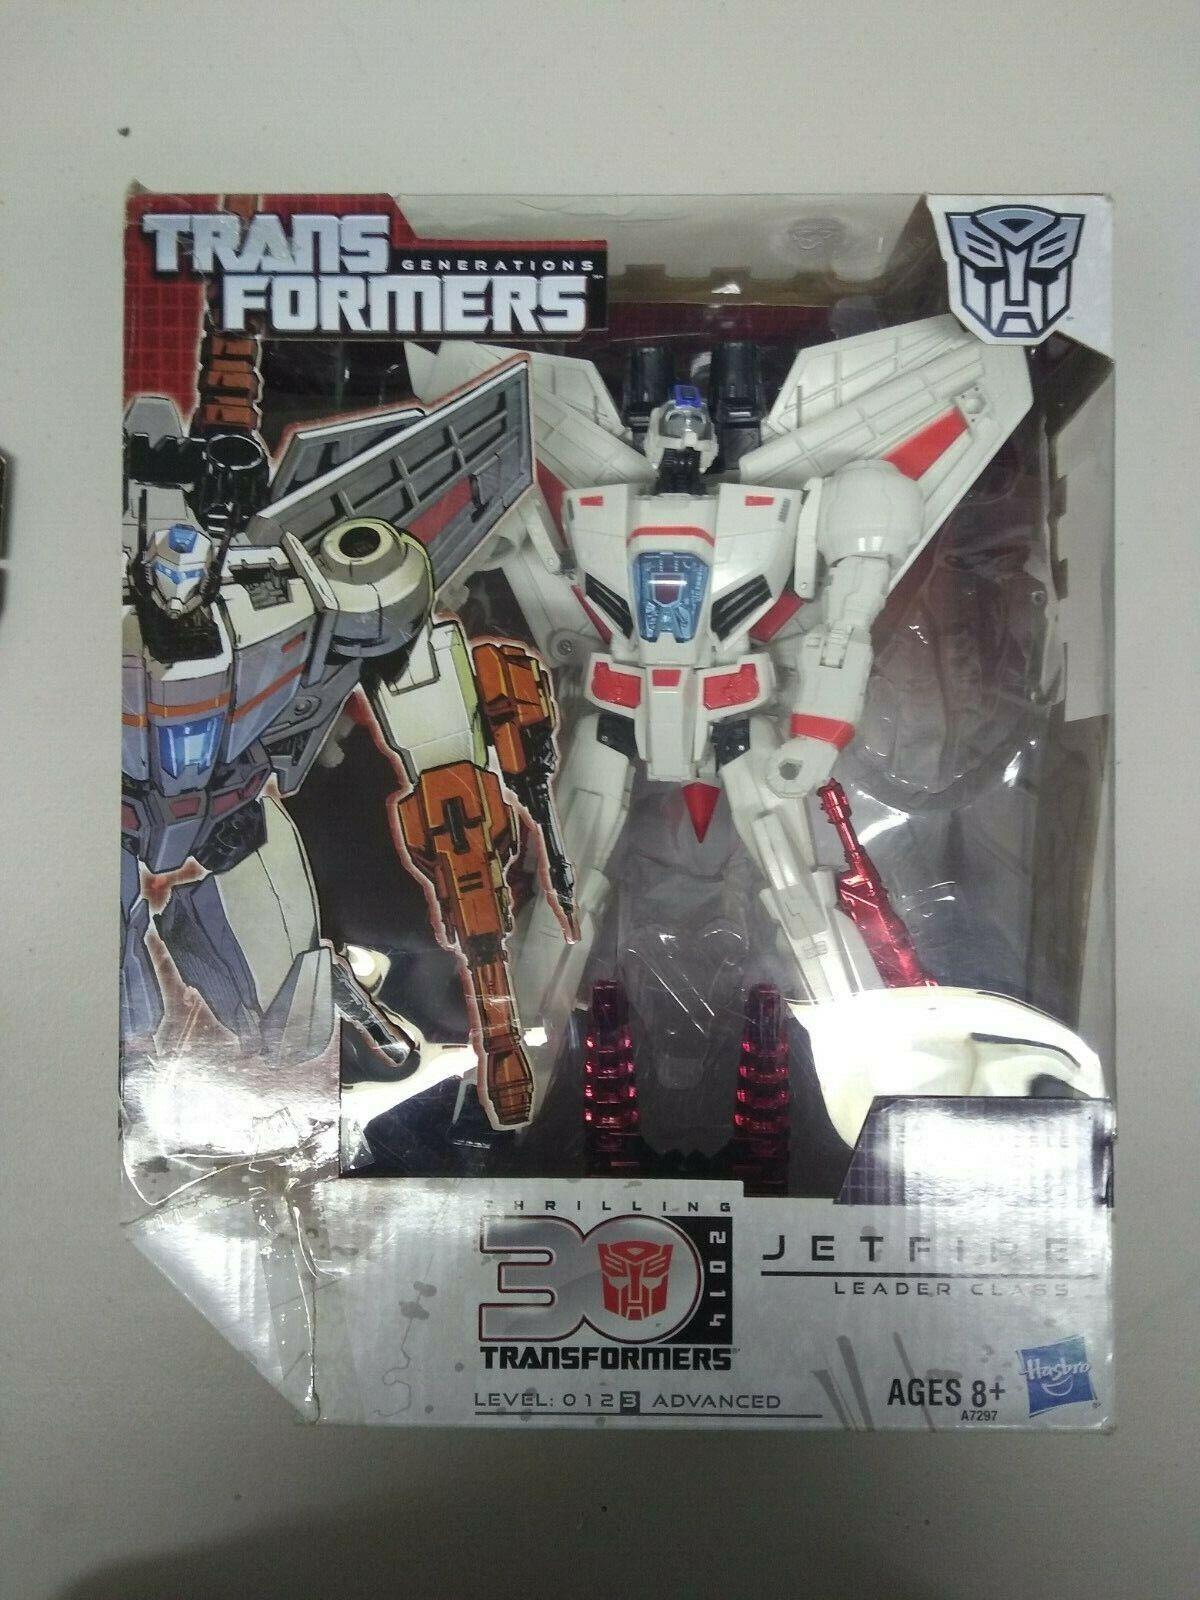 Transformers generations jetfire used w box parts missing